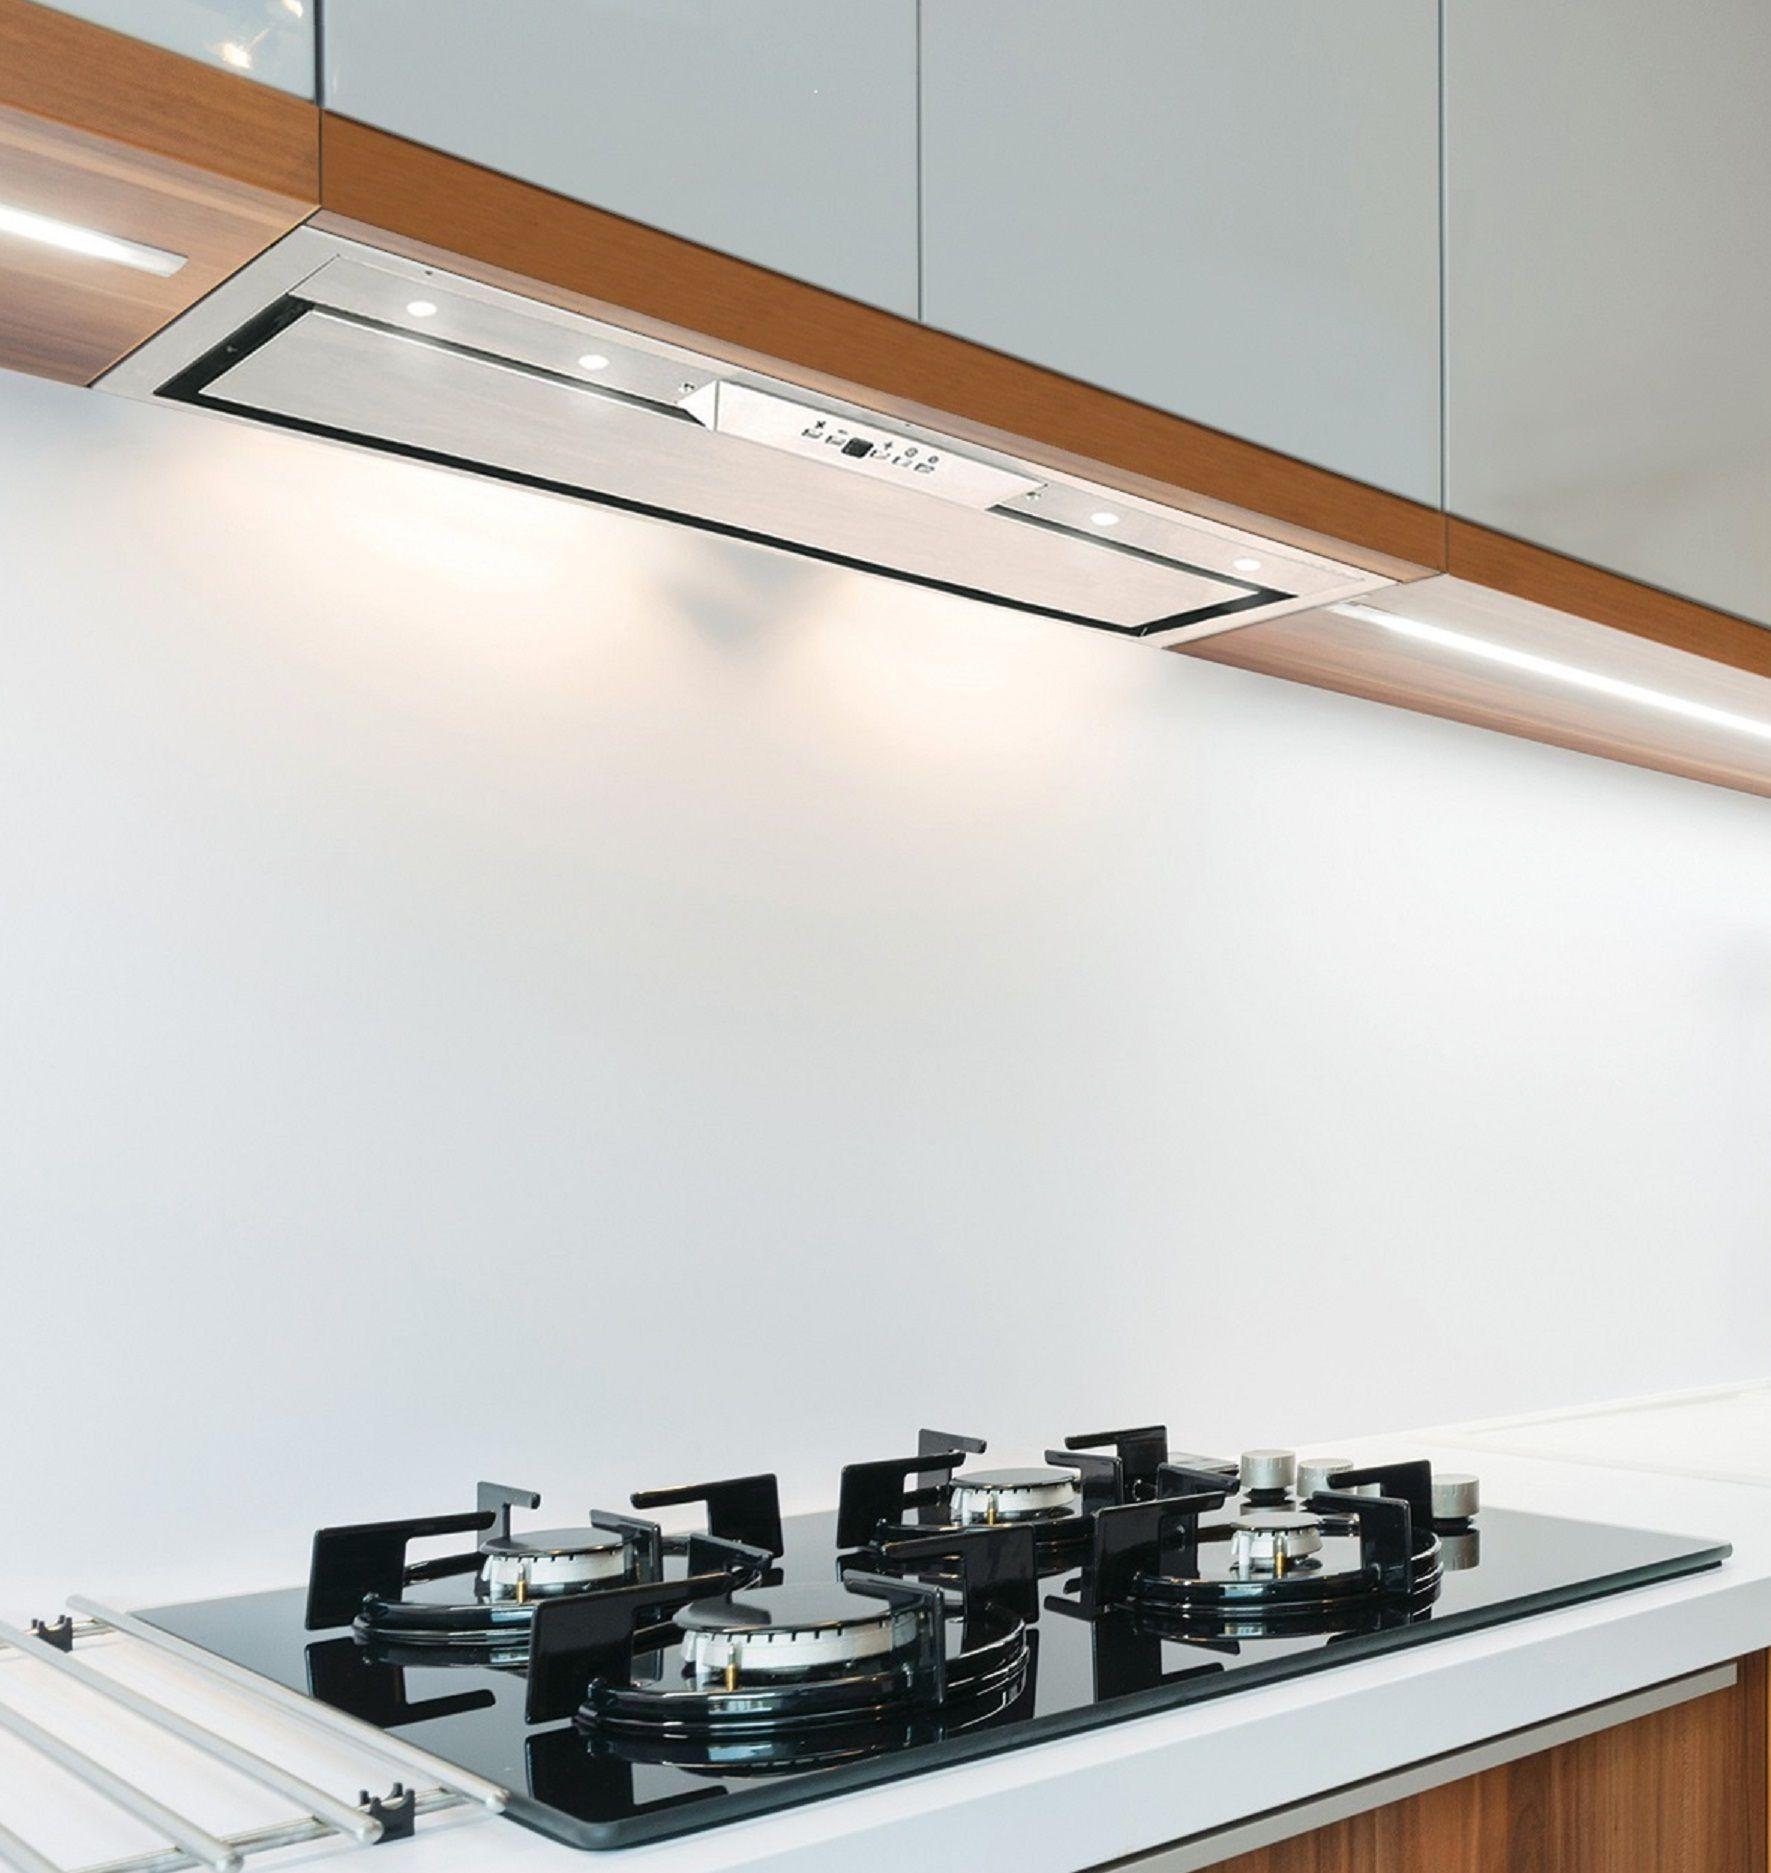 79cm Built In Canopy Cooker Hood Stainless Steel Finish Led